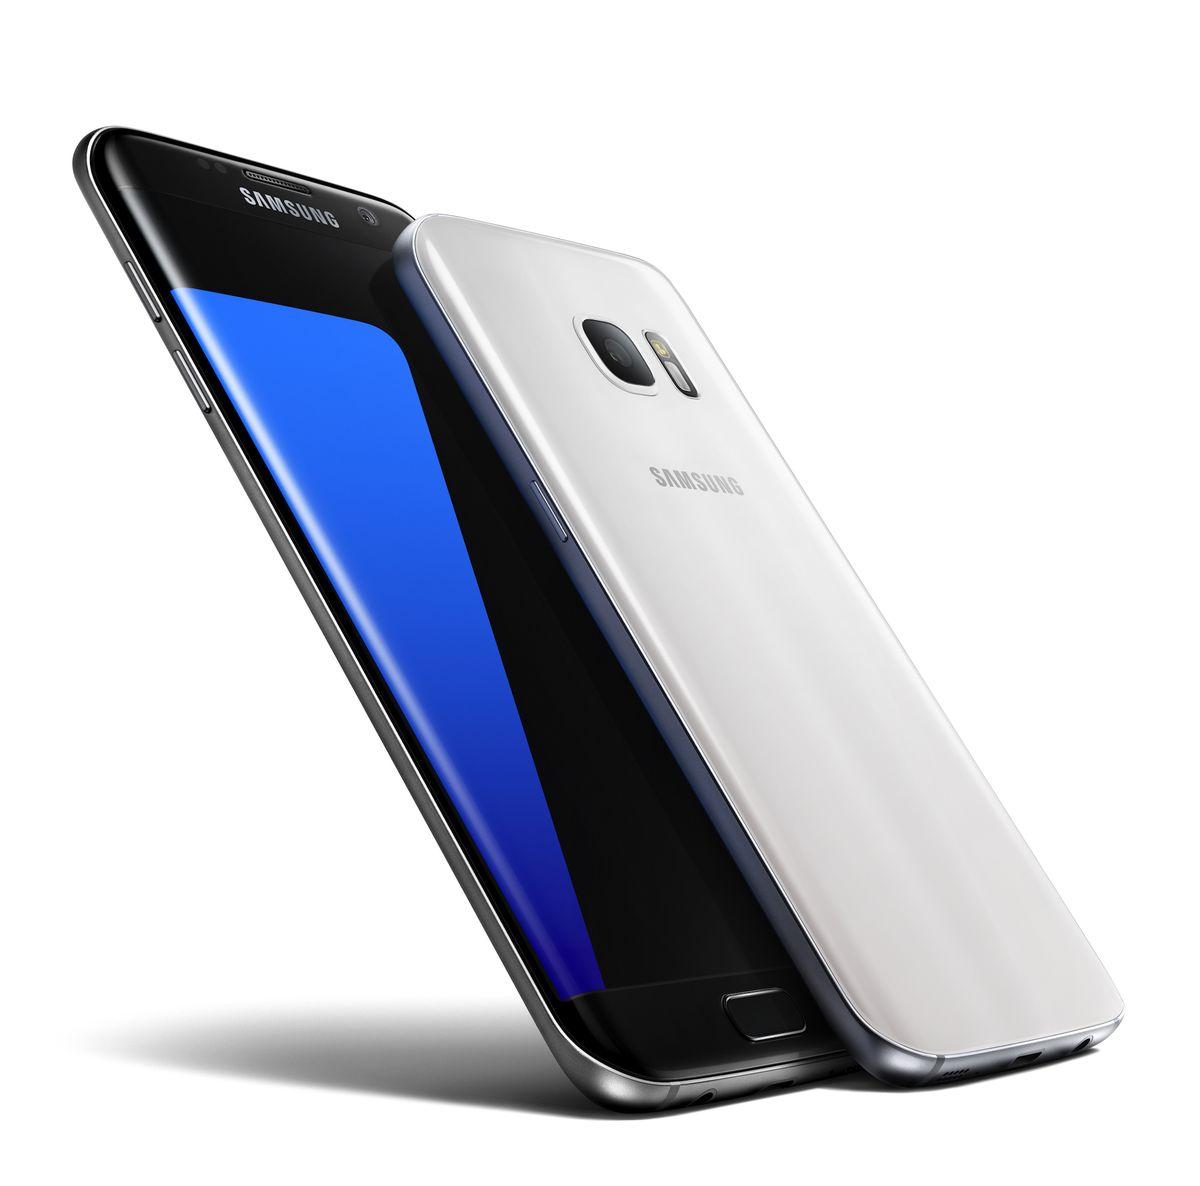 Samsung's Galaxy S7 Edge